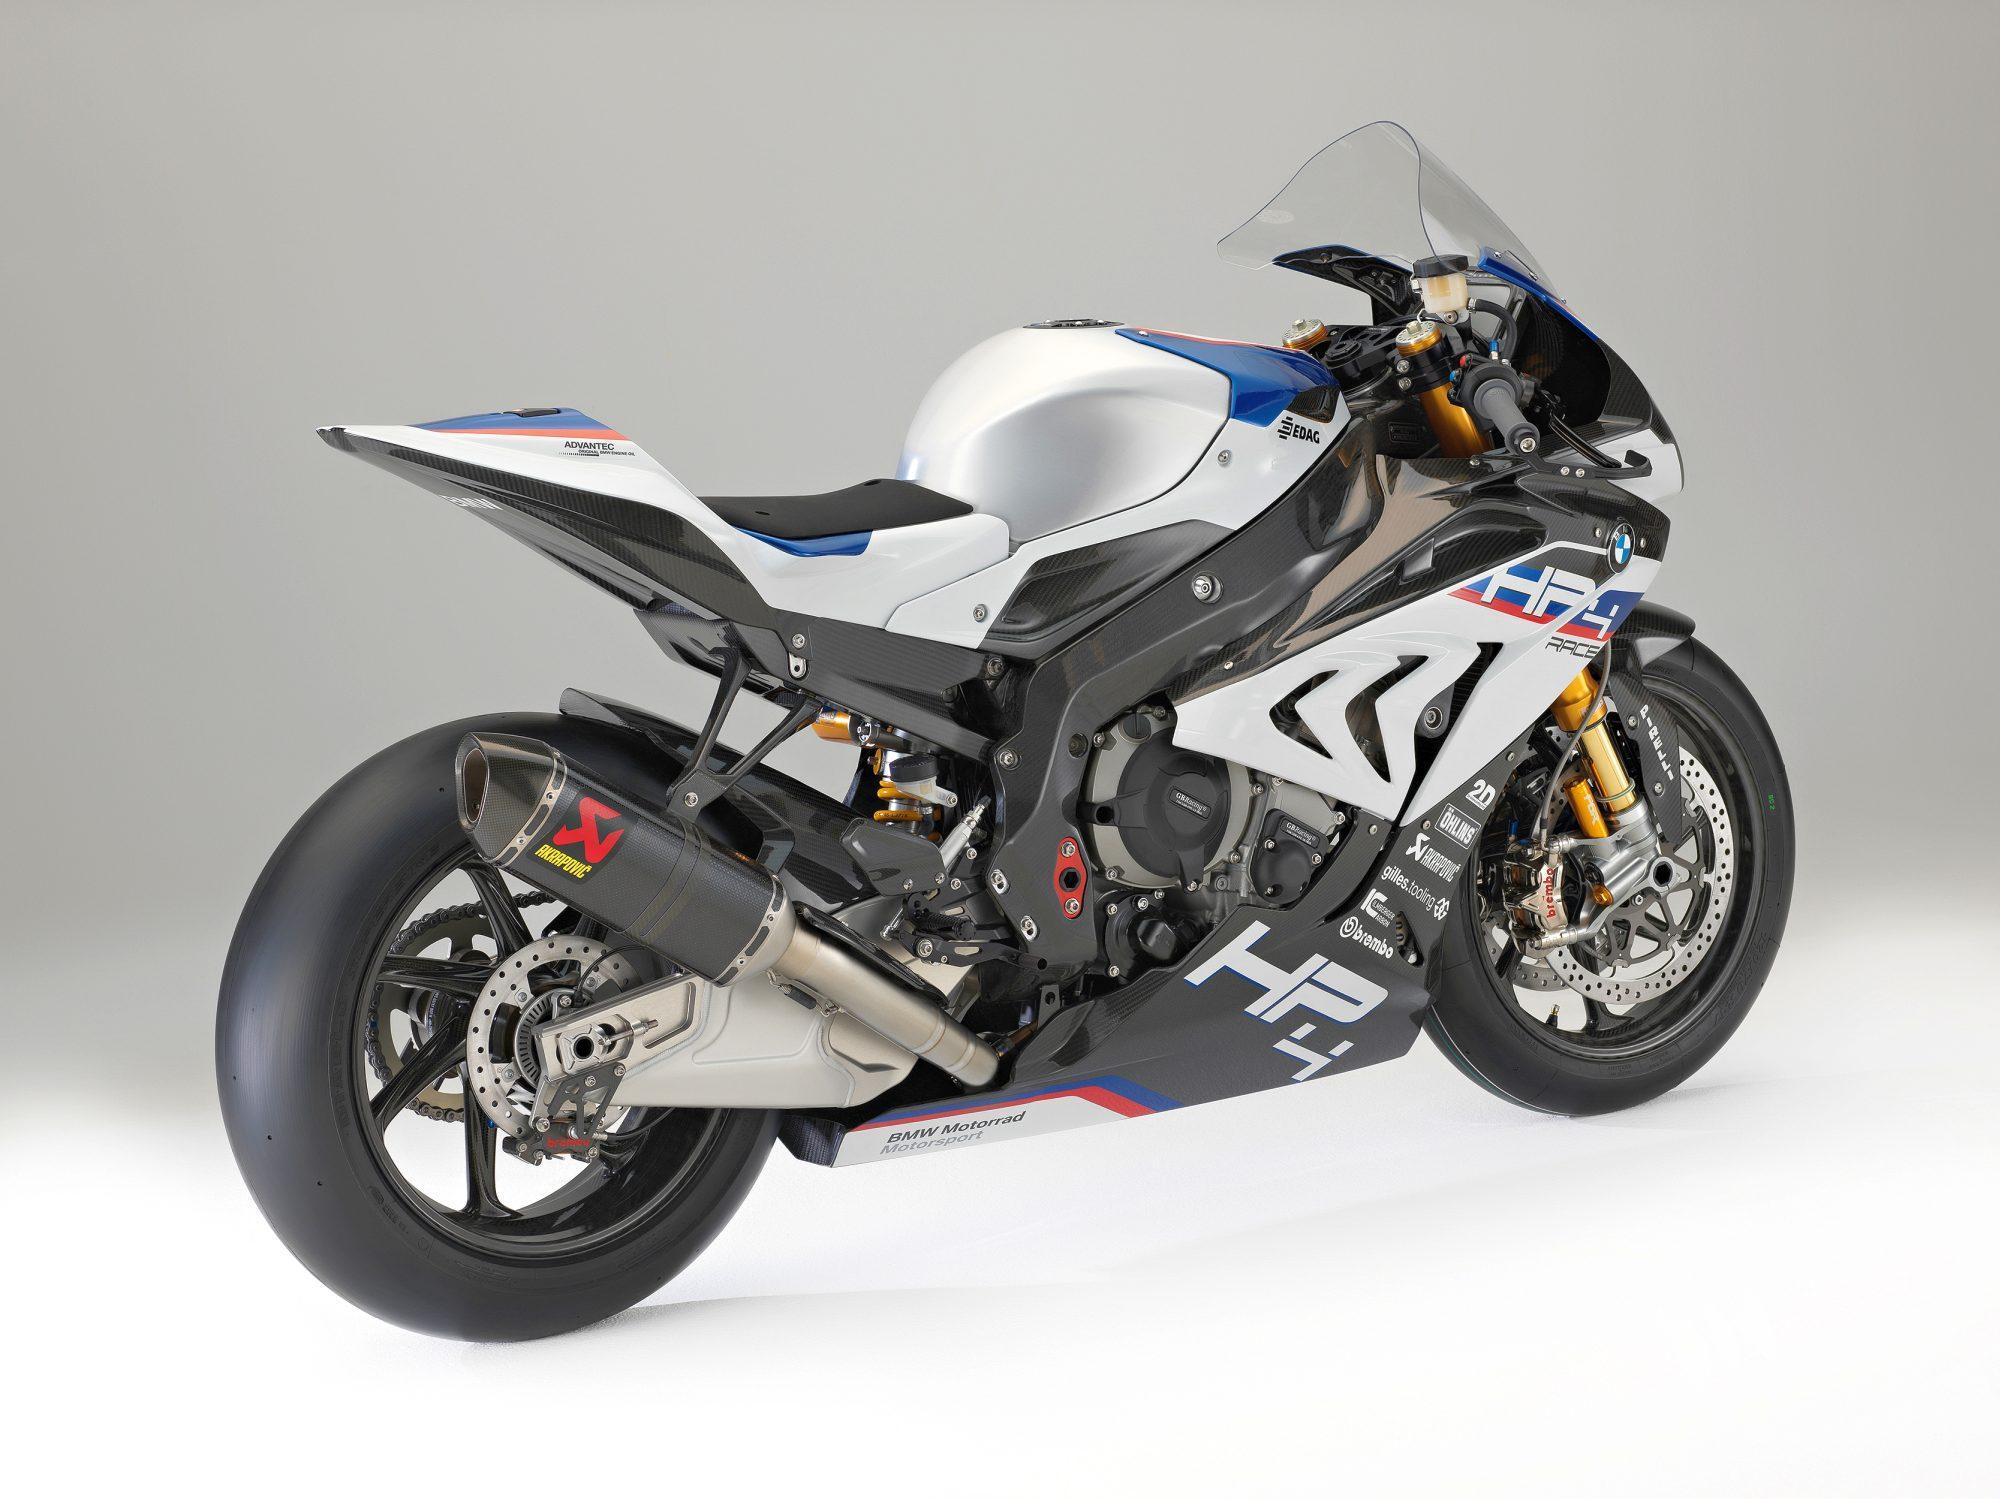 bmw s1000rr hp4 carbon race motorrad fotos motorrad bilder. Black Bedroom Furniture Sets. Home Design Ideas